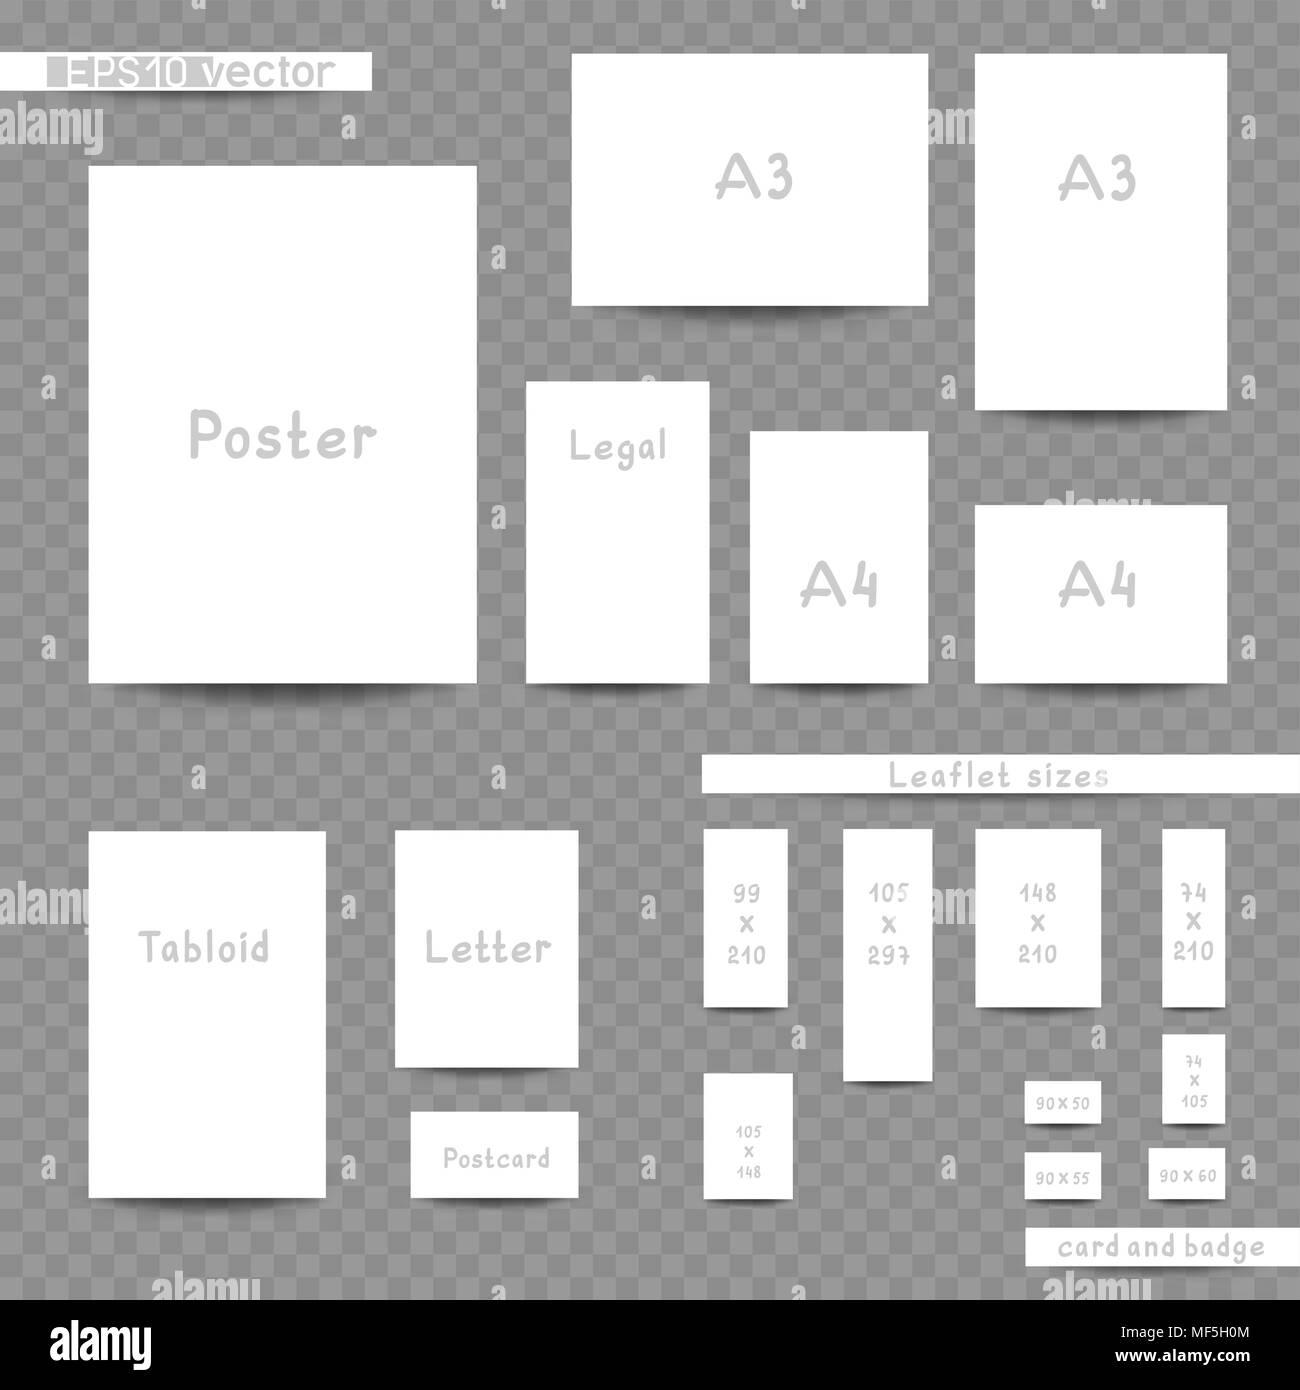 Booklet Vectors Stock Photos & Booklet Vectors Stock Images - Alamy